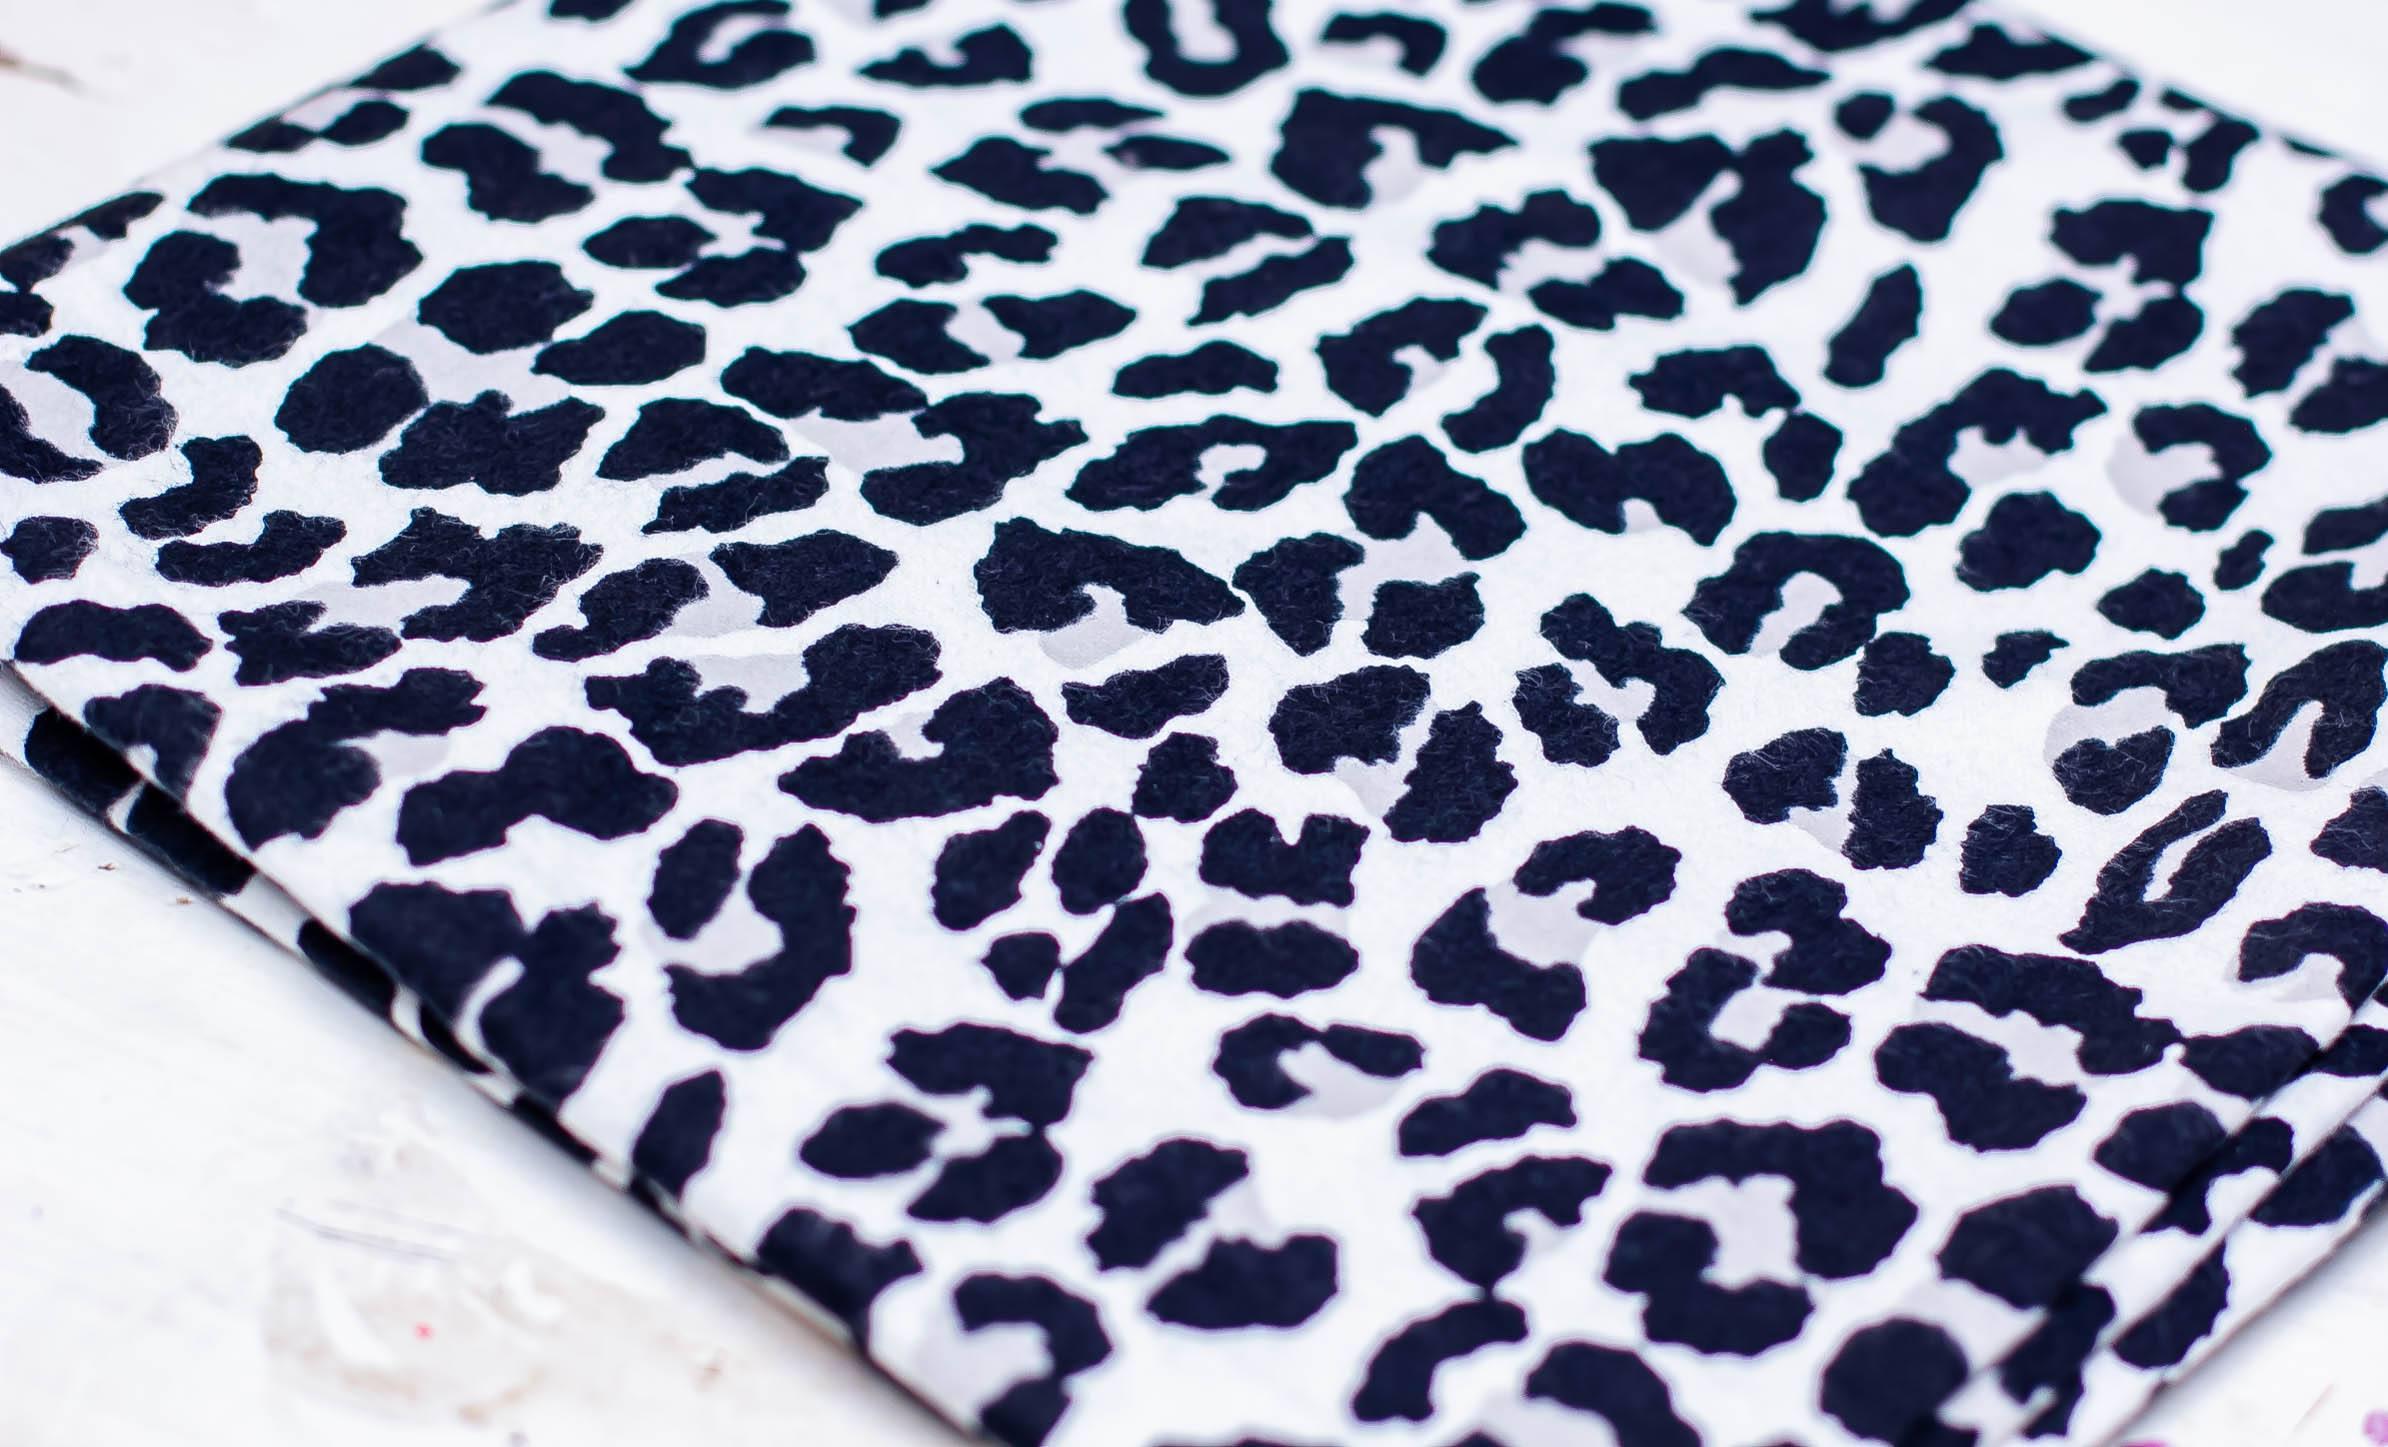 Leopard Print Felt Mask Kind Shop 4